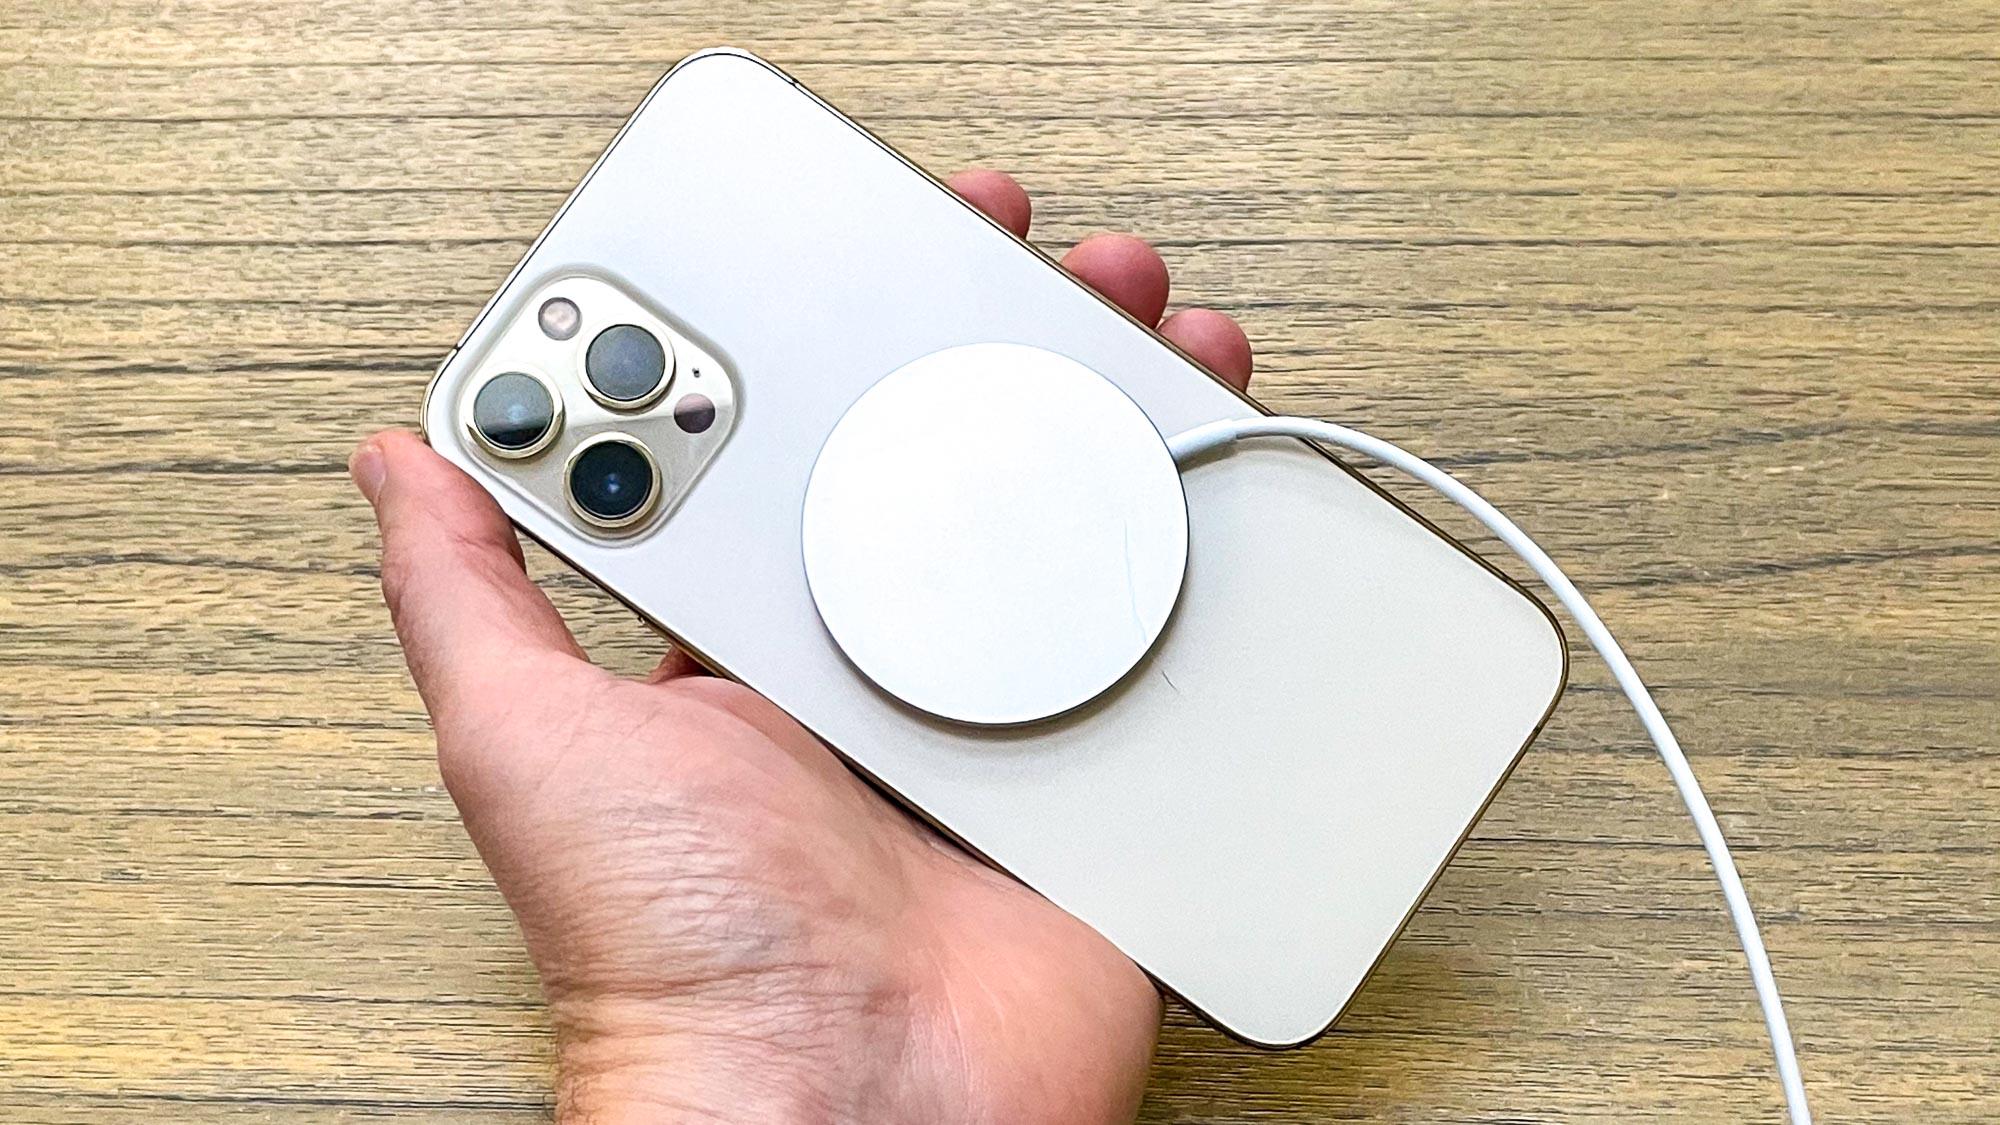 iPhone 12 Pro Max MagSafe